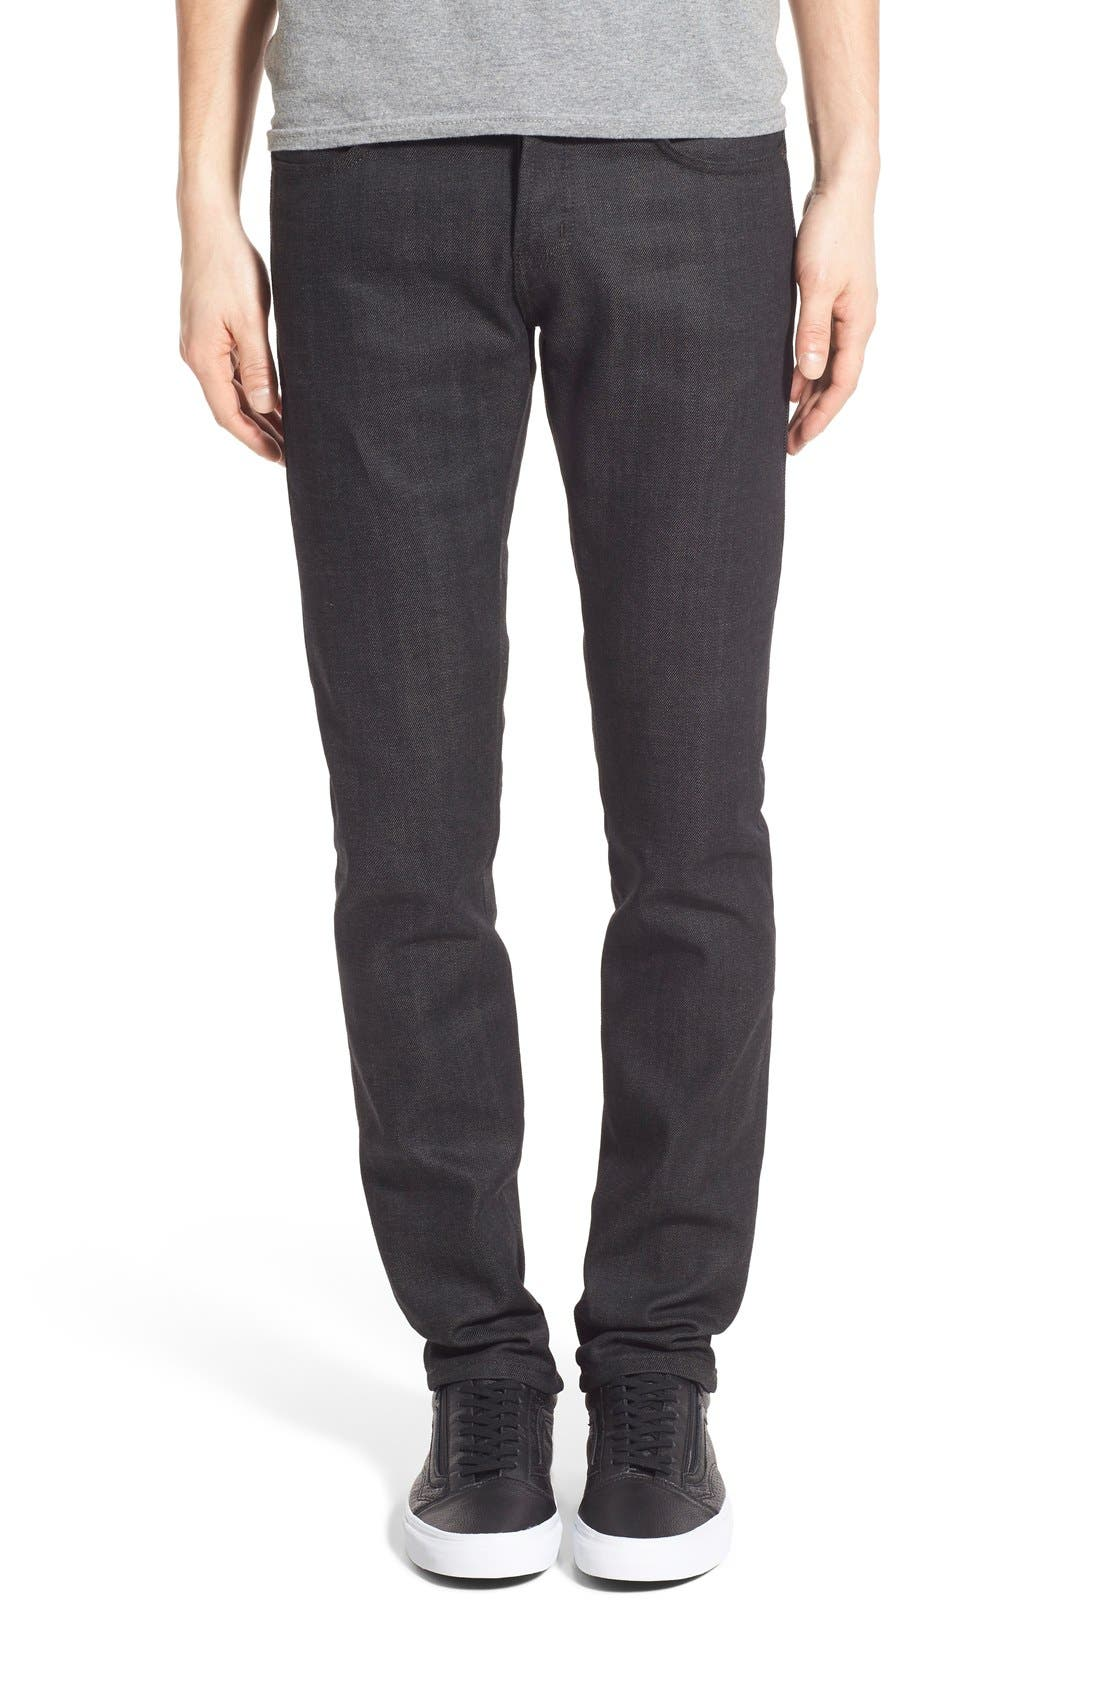 Naked & Famous Super Skinny Guy Skinny Fit Stretch Jeans (Black x Grey Selvedge)